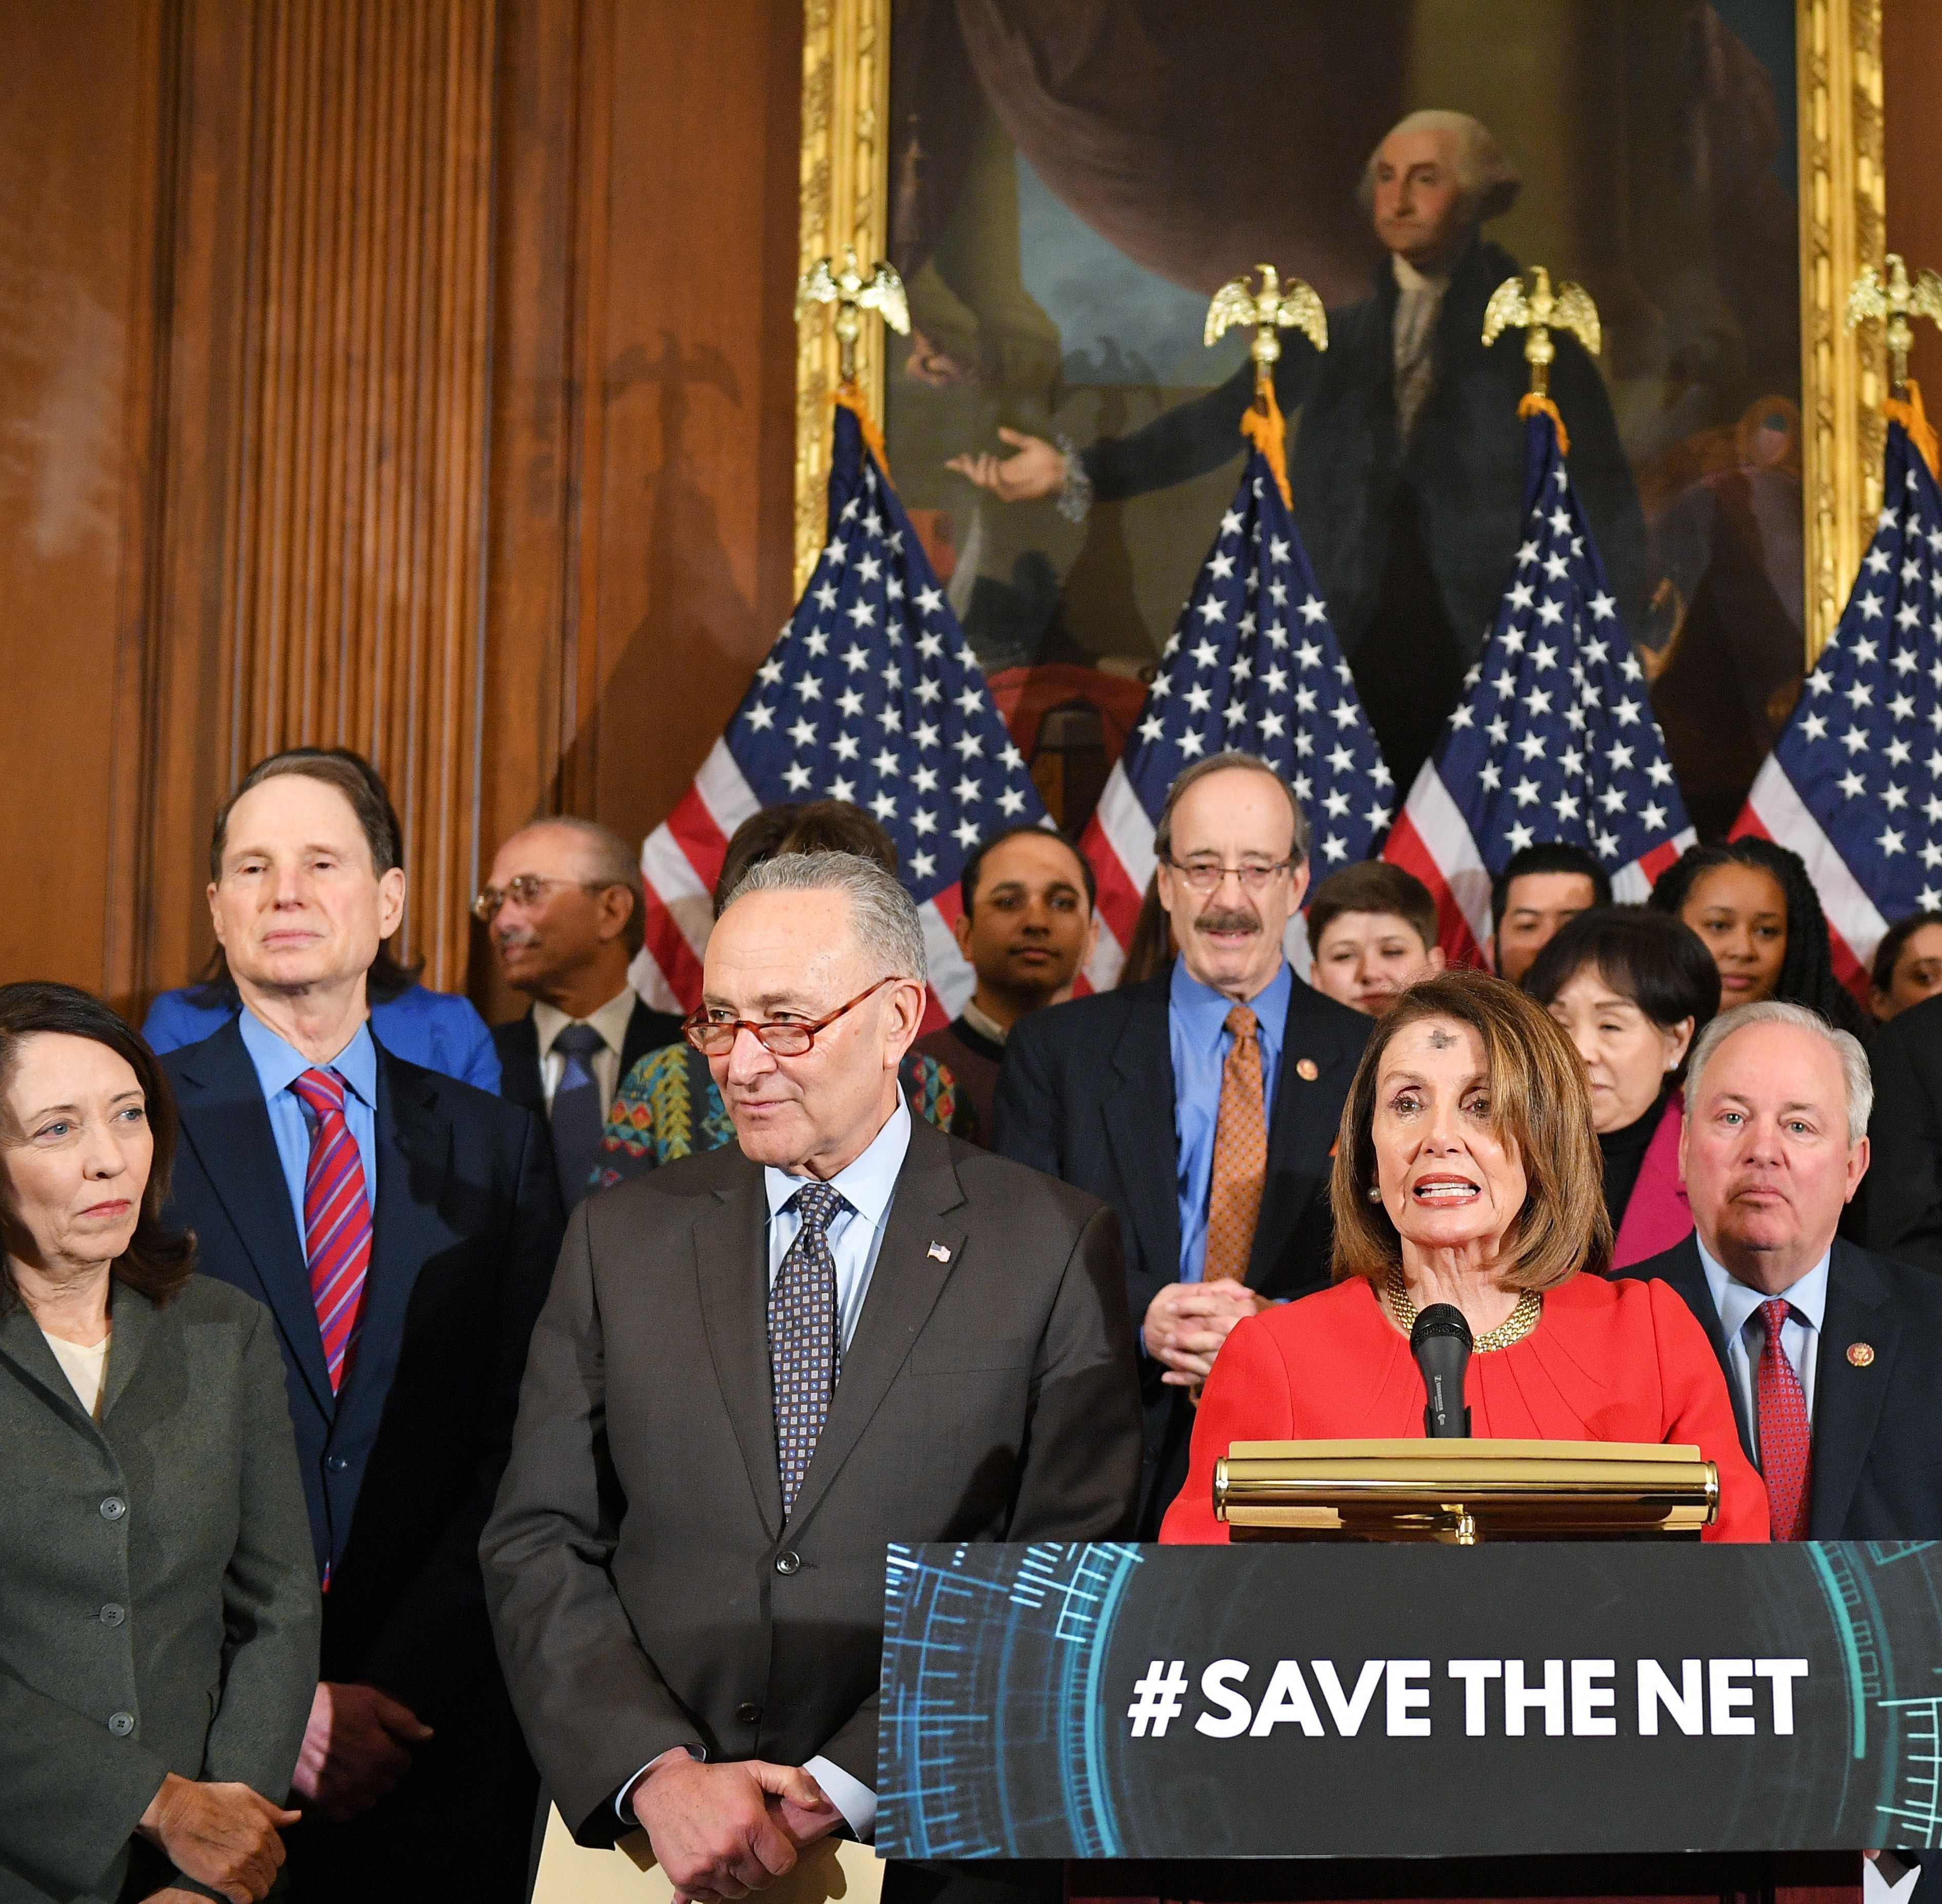 Democrats' latest net neutrality bill is a partisan death sentence for internet innovation